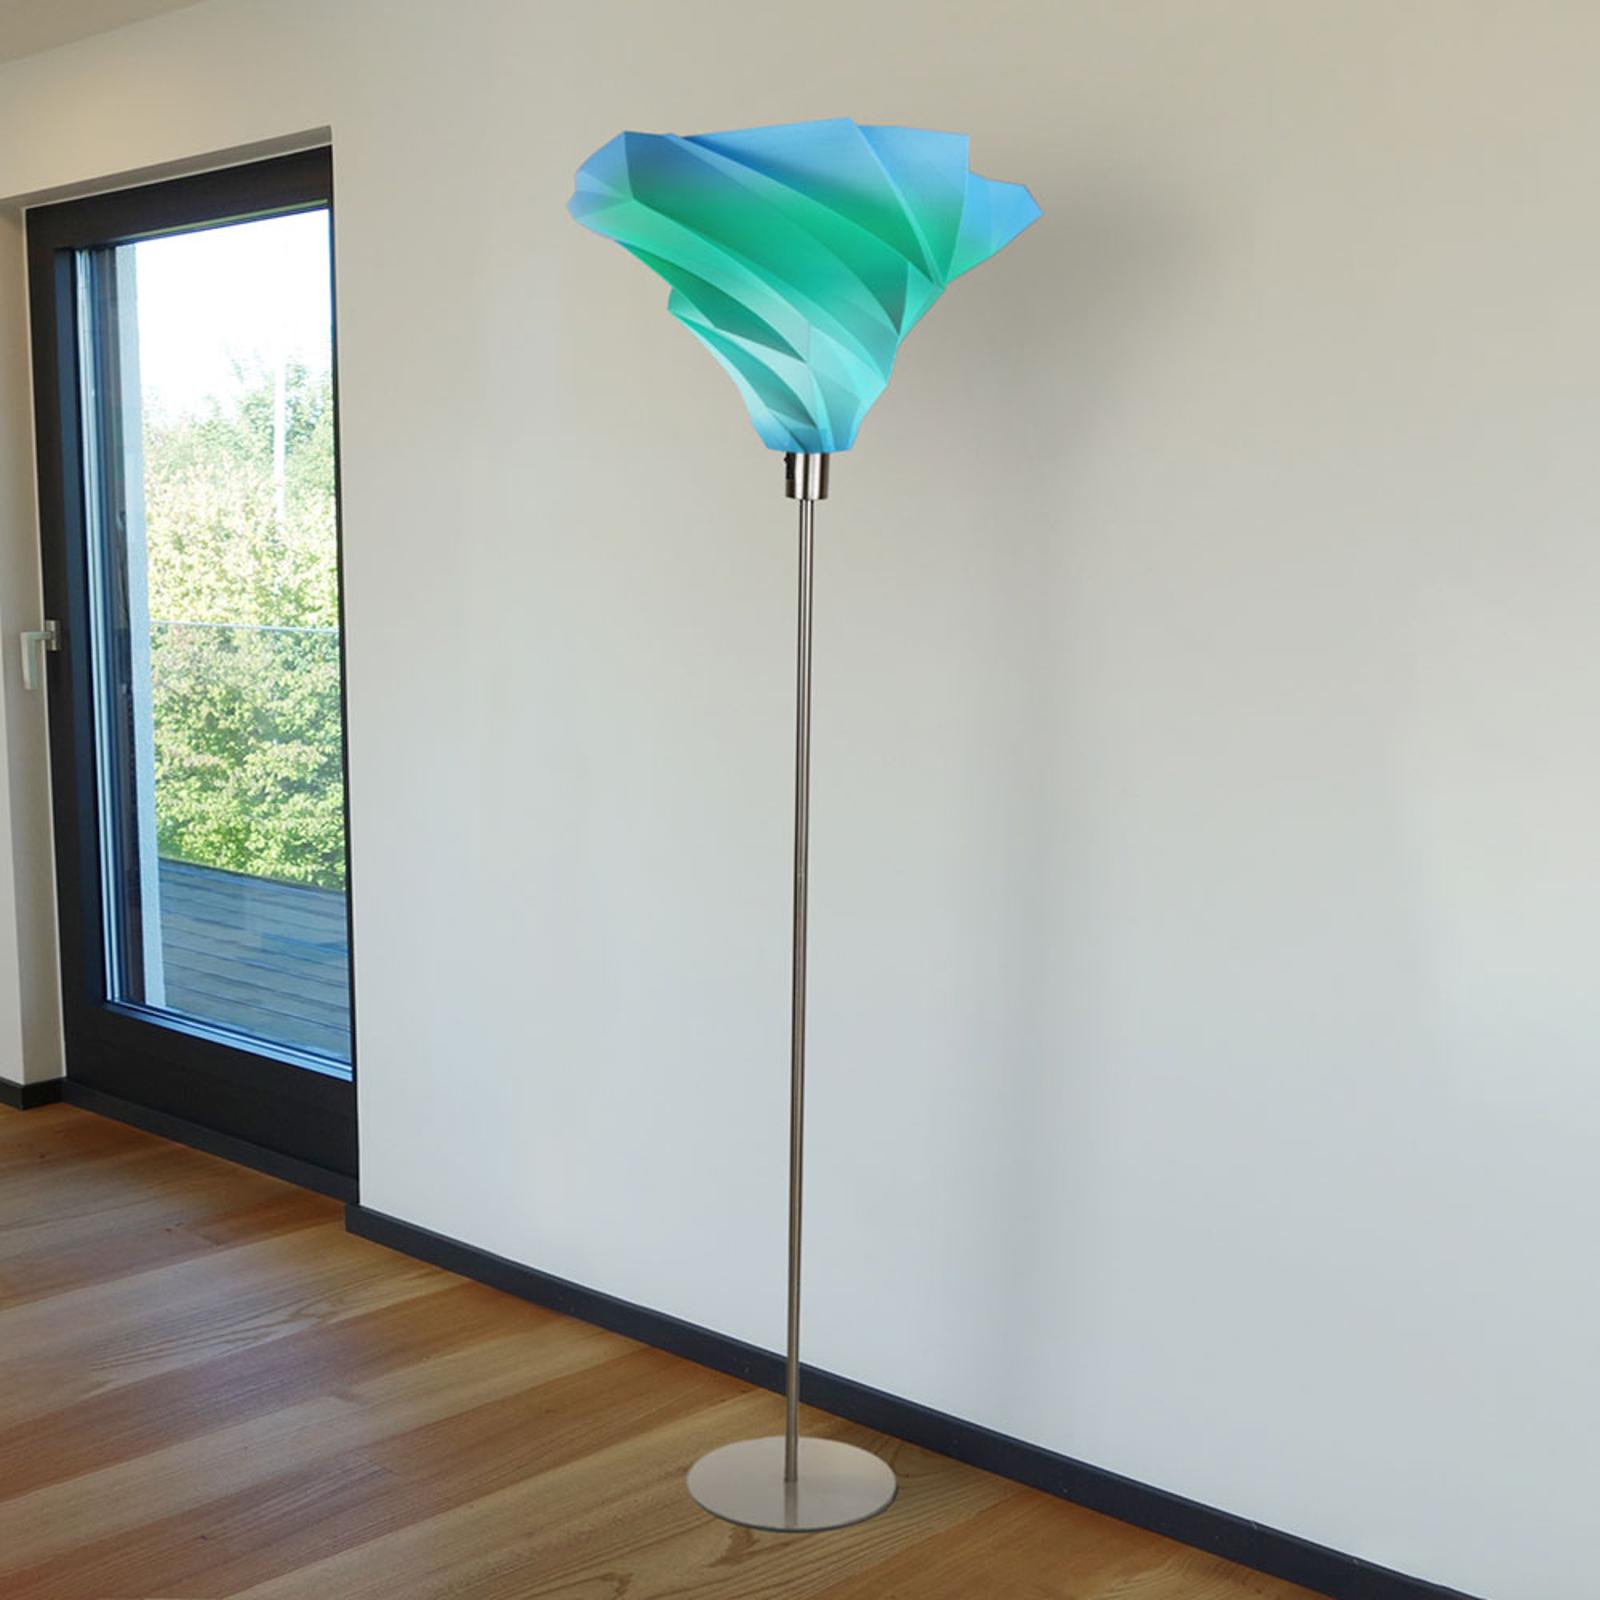 Twister design vloerlamp Ø 30cm multicolour